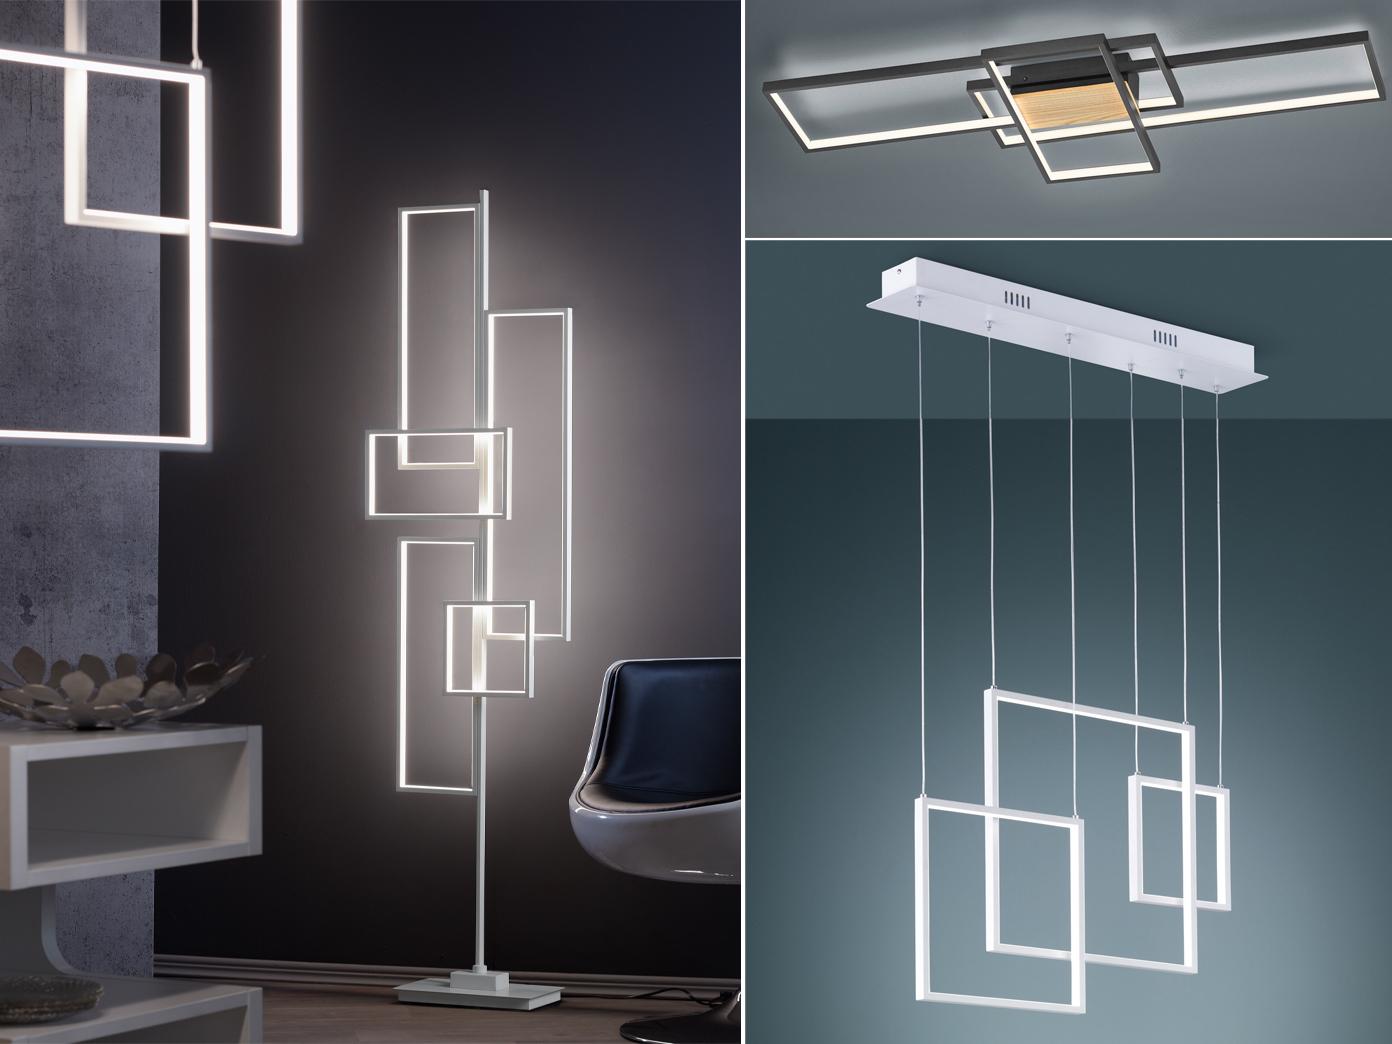 Details zu LED Flurbeleuchtung Lampen den langen Flur Diele Treppenhaus für  offene Galerie